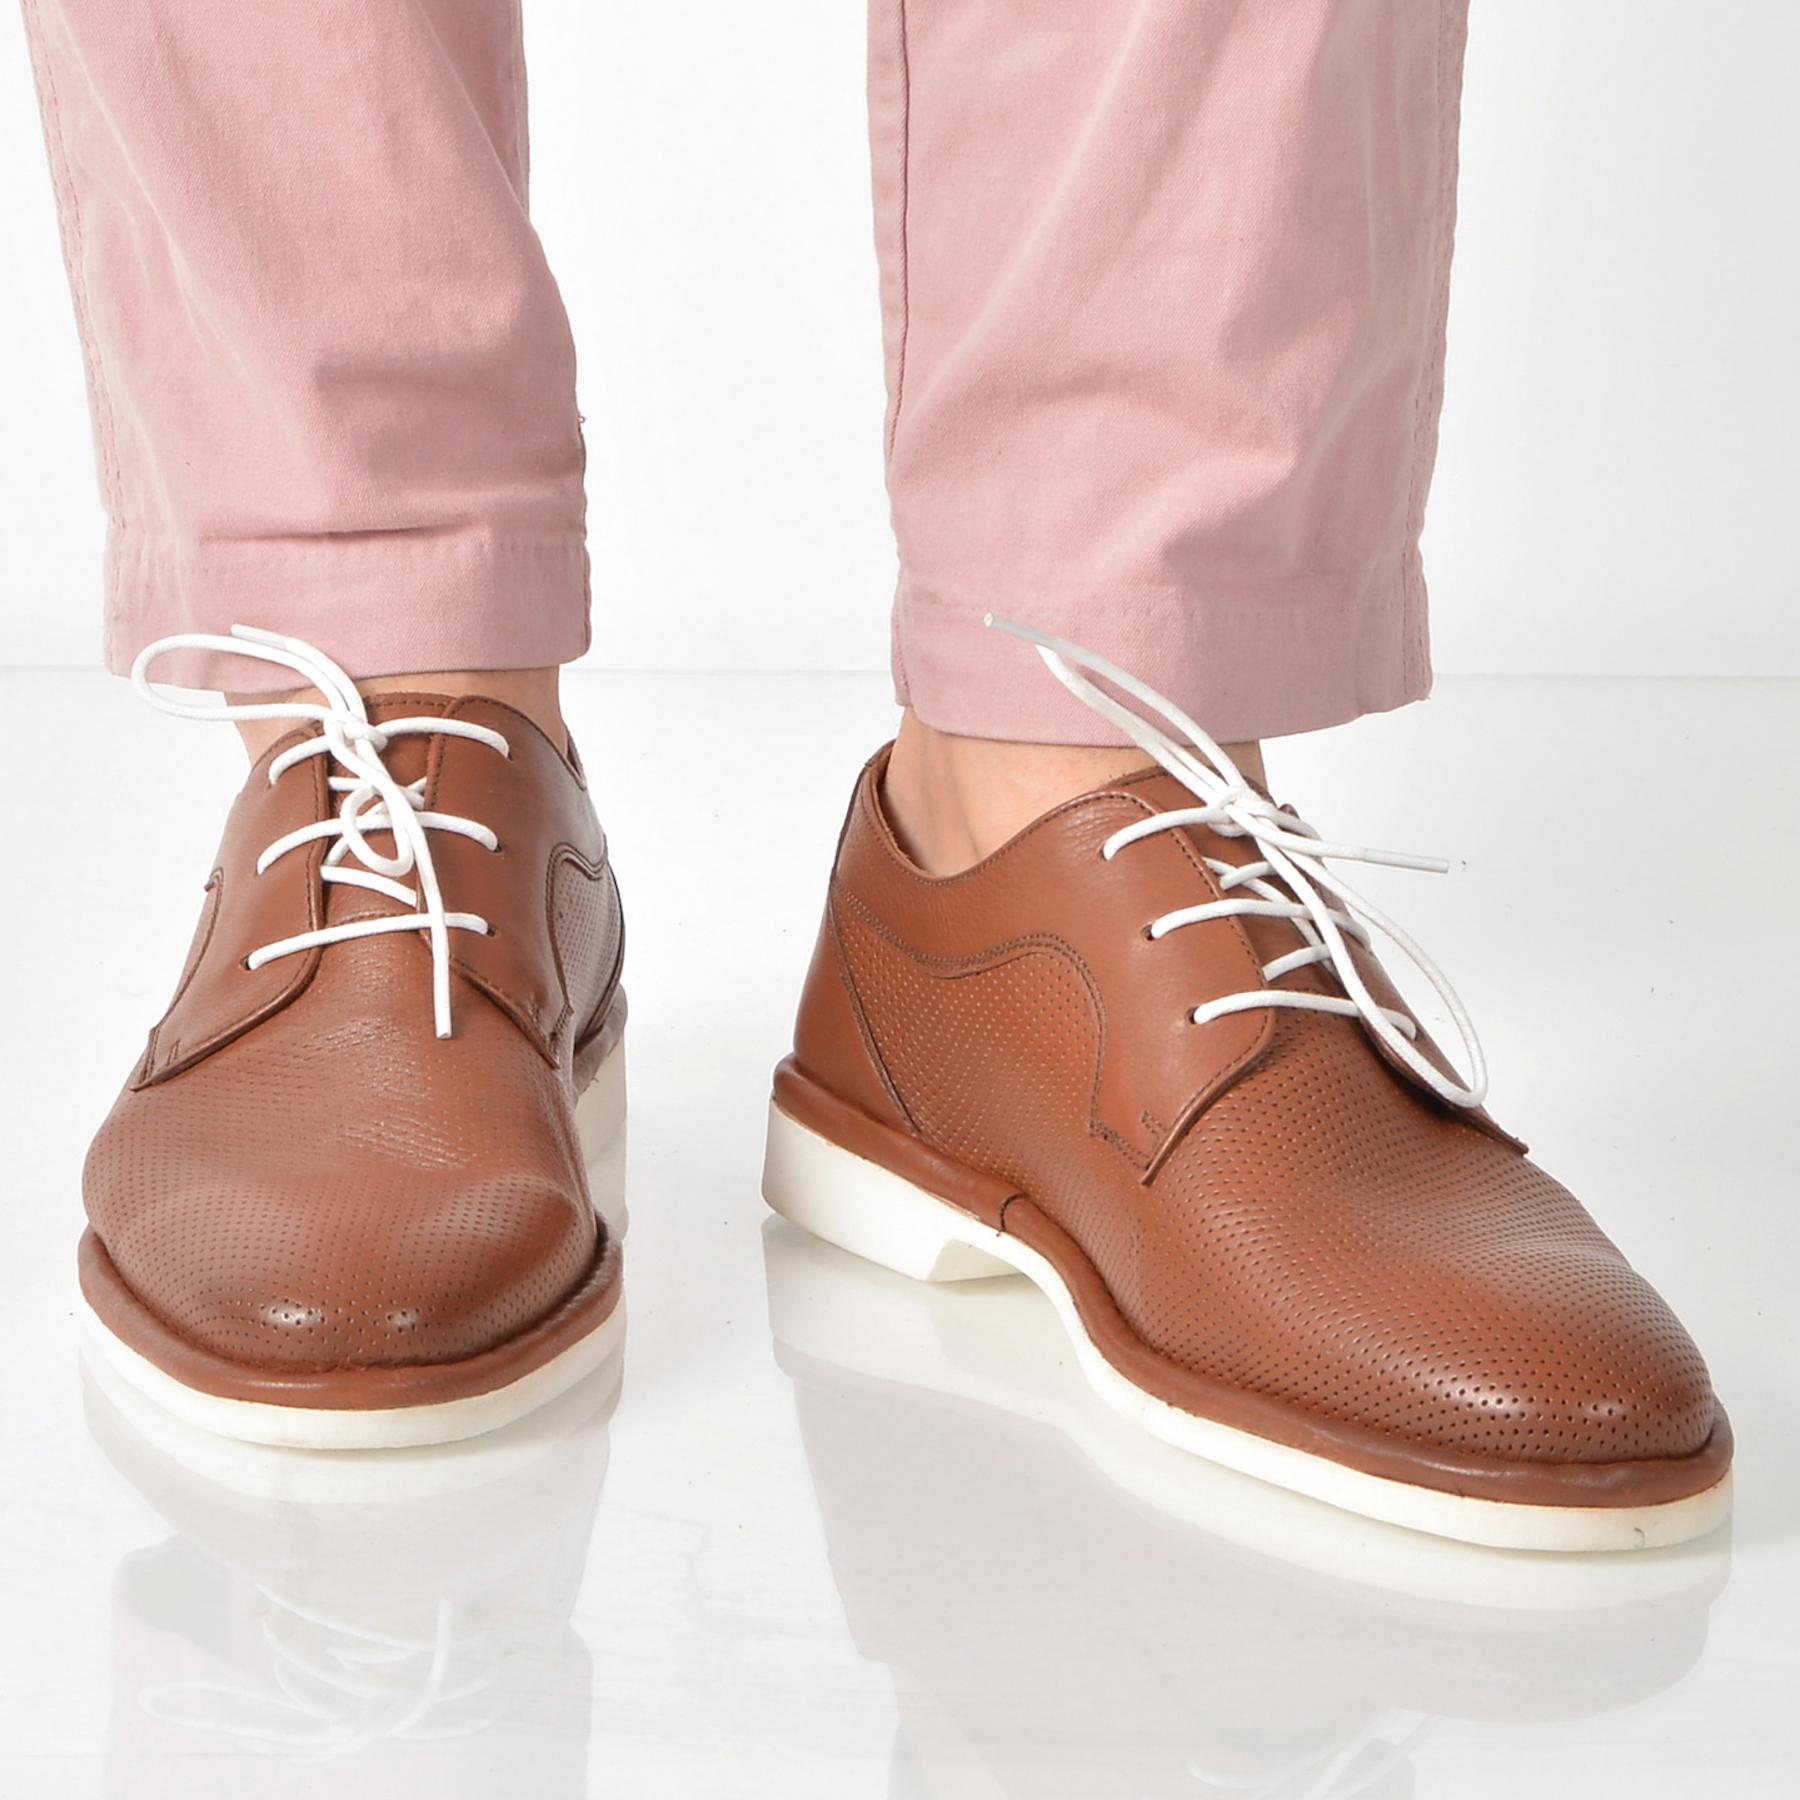 Pantofi OTTER maro, 4450, din piele naturala